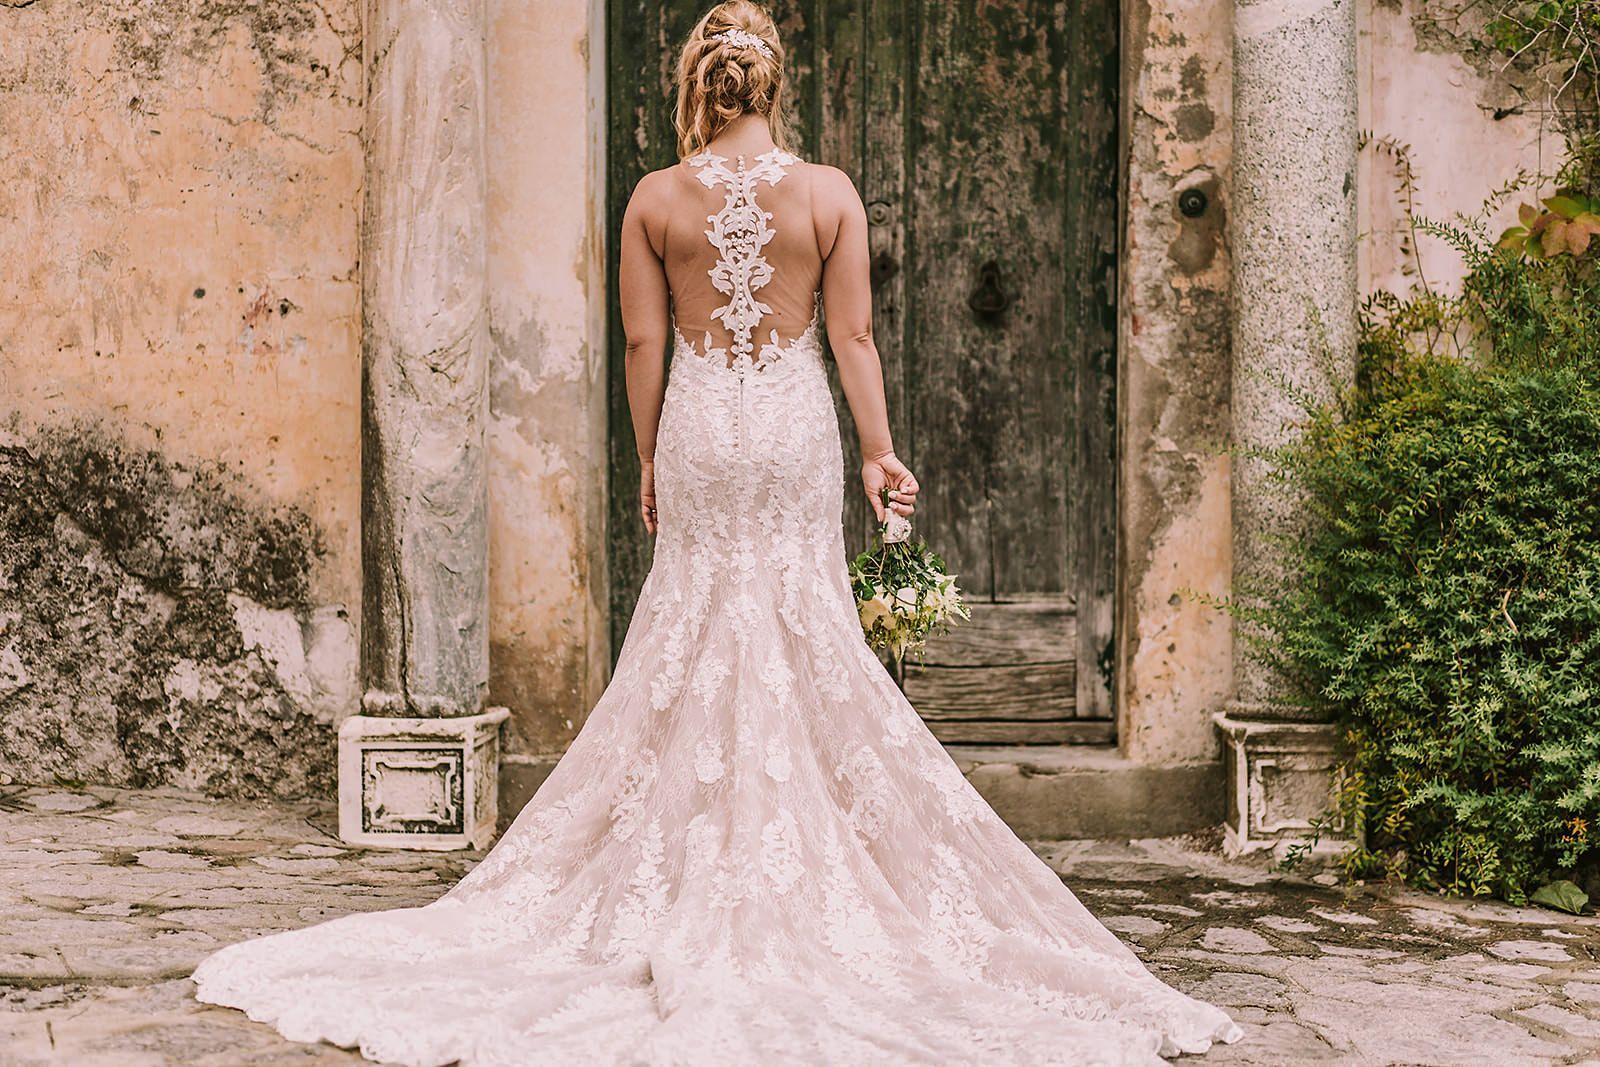 Wedding Dress Consignment Stores Las Vegas Saddha